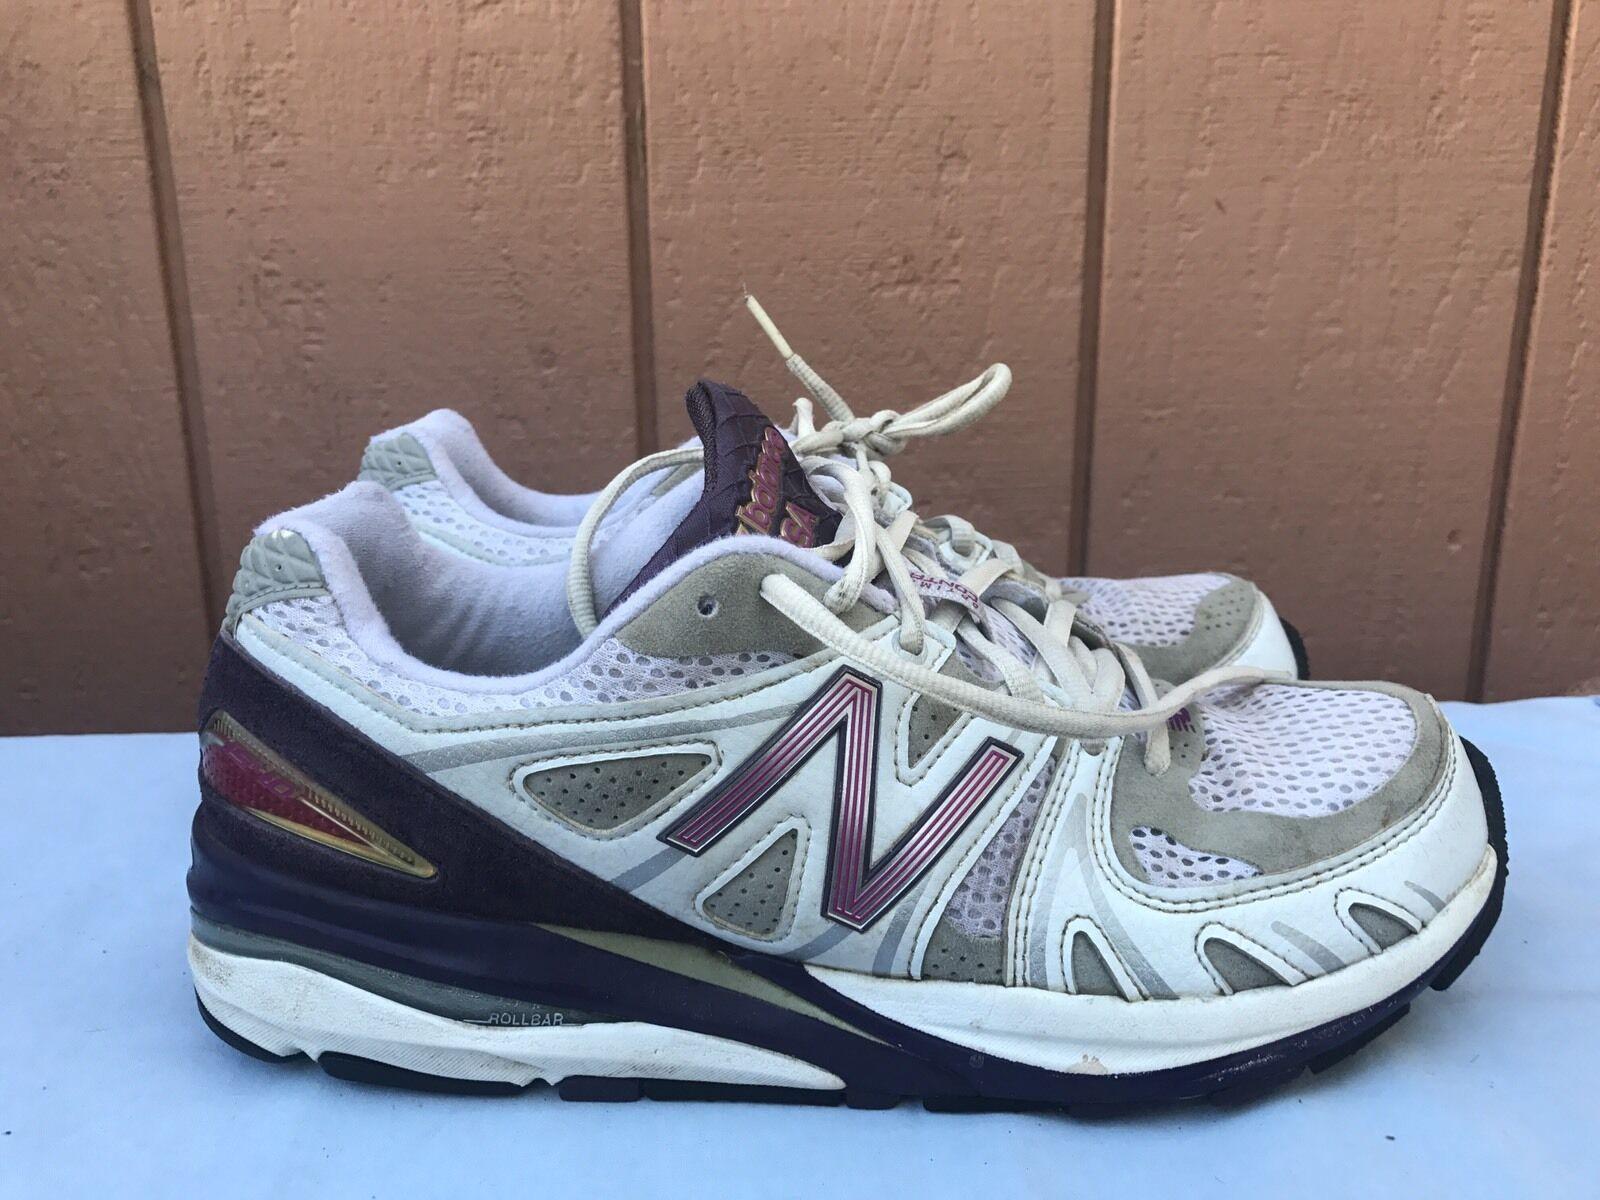 New balance 1540 Para Mujer Zapatos Para Caminar Caminar Caminar W1540WP blancoo Talla US 10.5 B EUR 42.5 EE. UU.  precios razonables